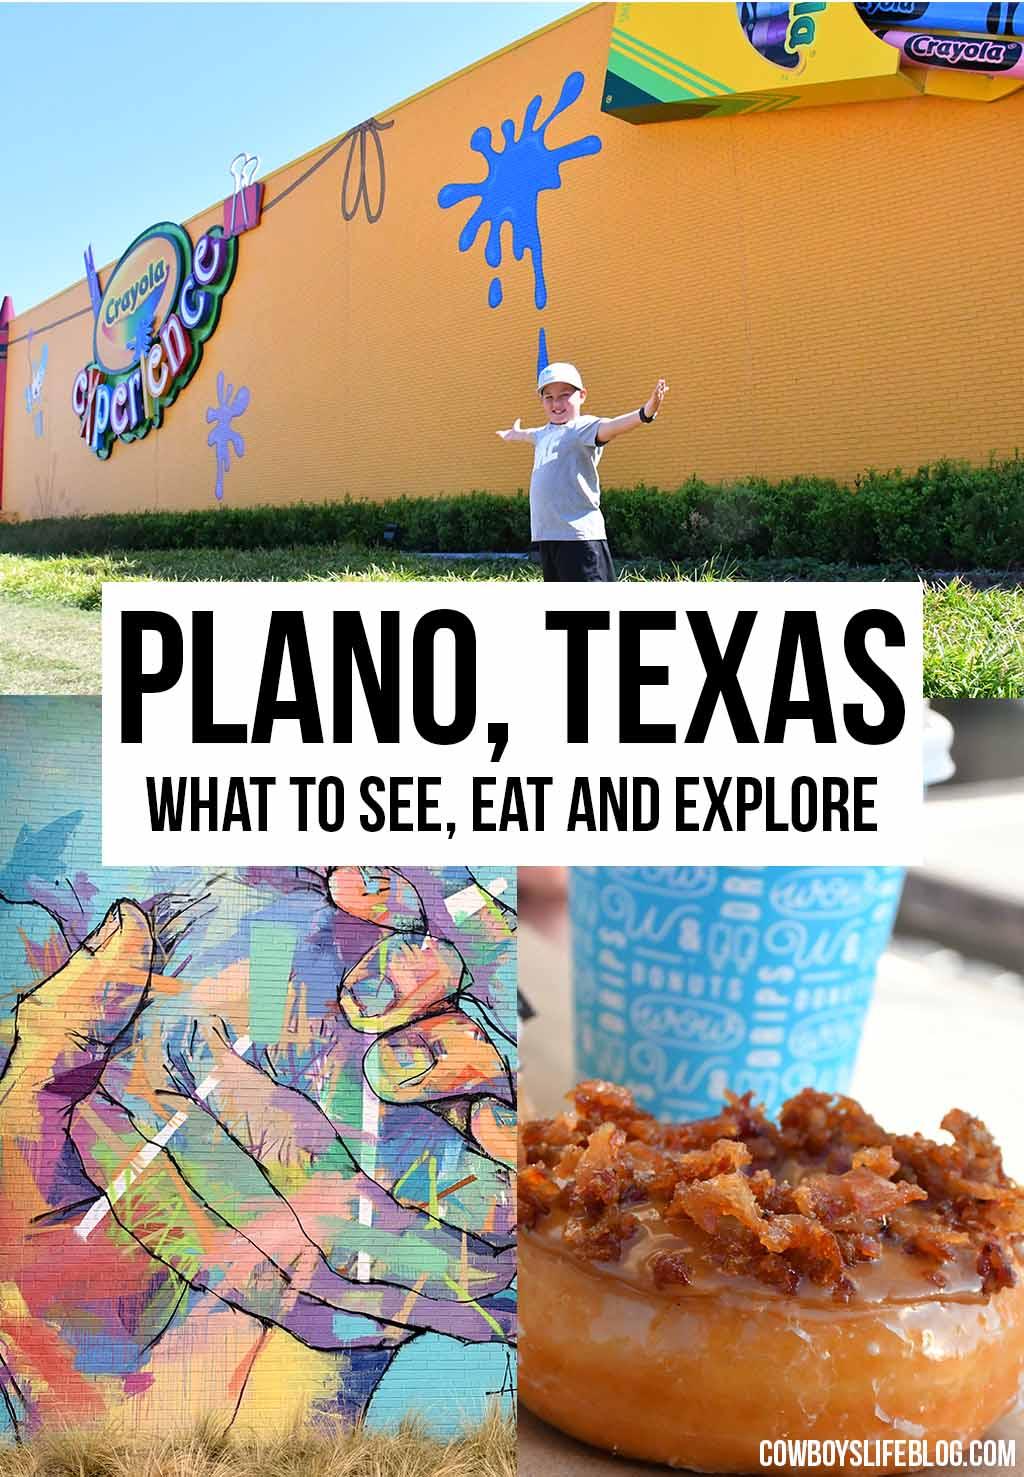 A Weekend Getaway in Plano, Texas